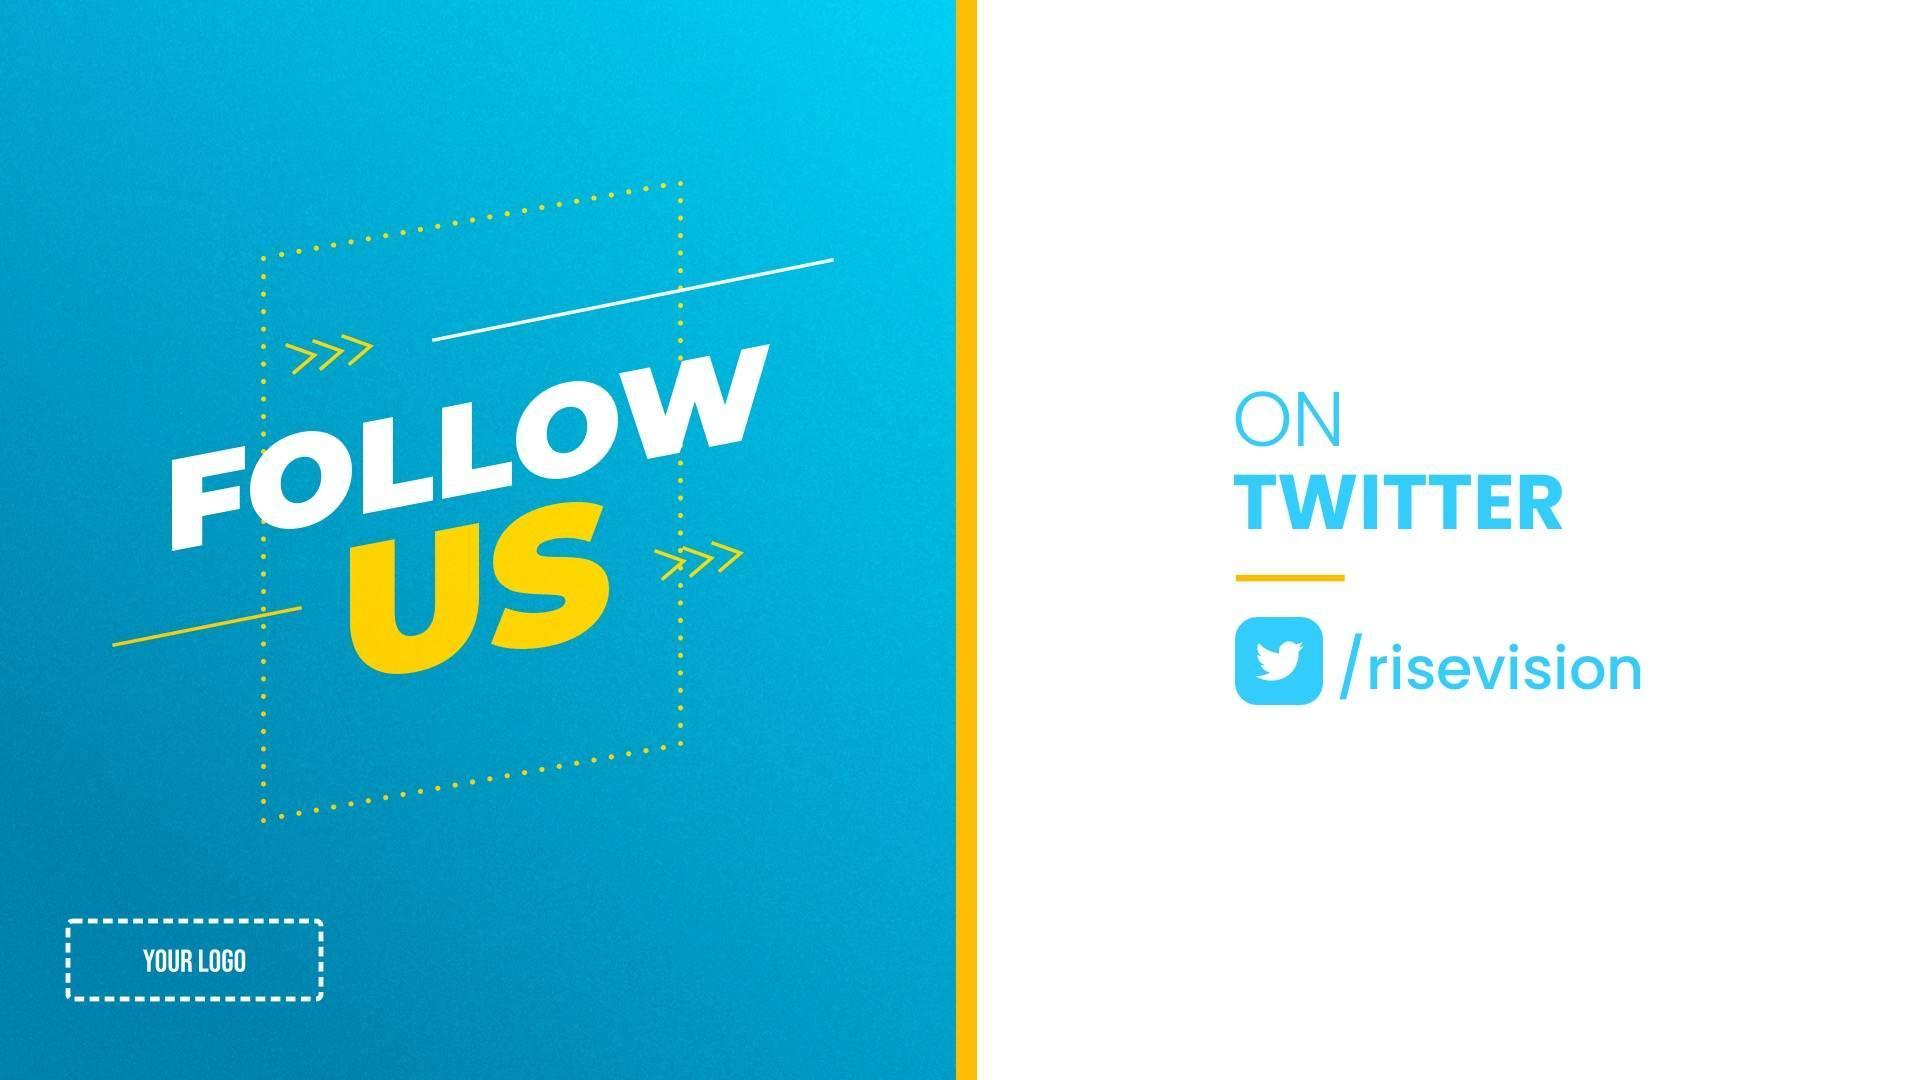 Follow Us on Twitter Digital Signage Template